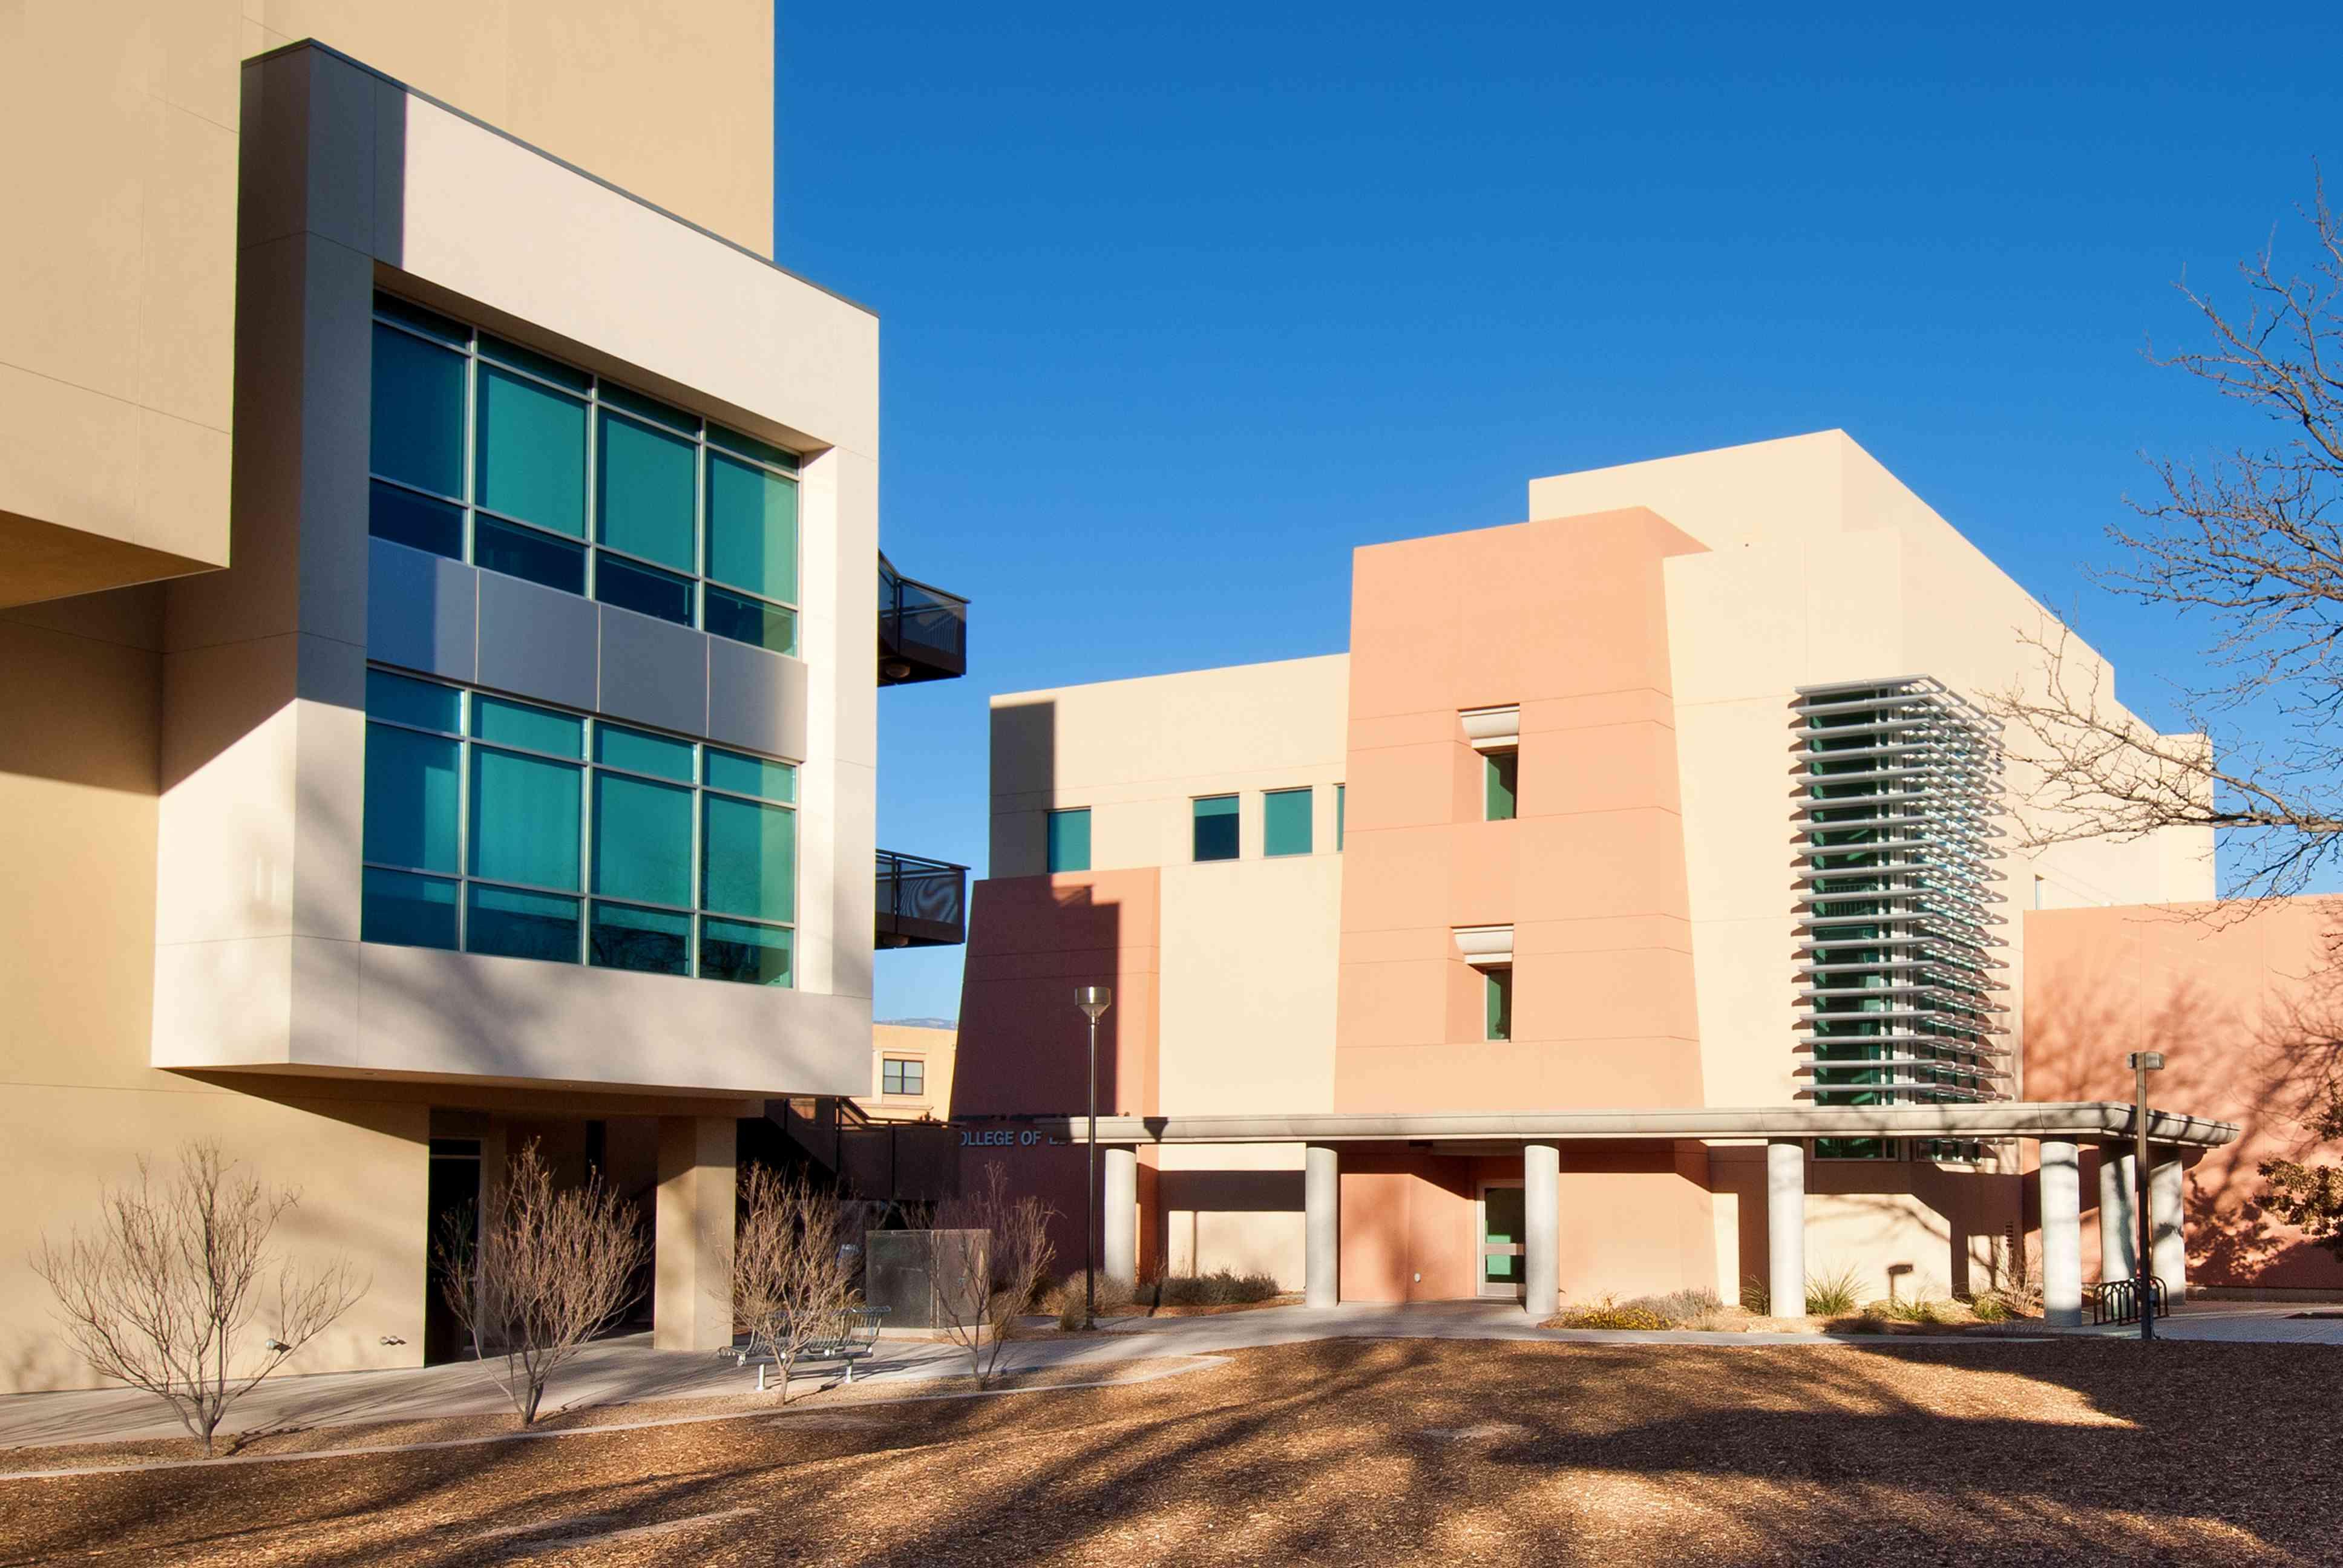 University of New Mexico Buildings